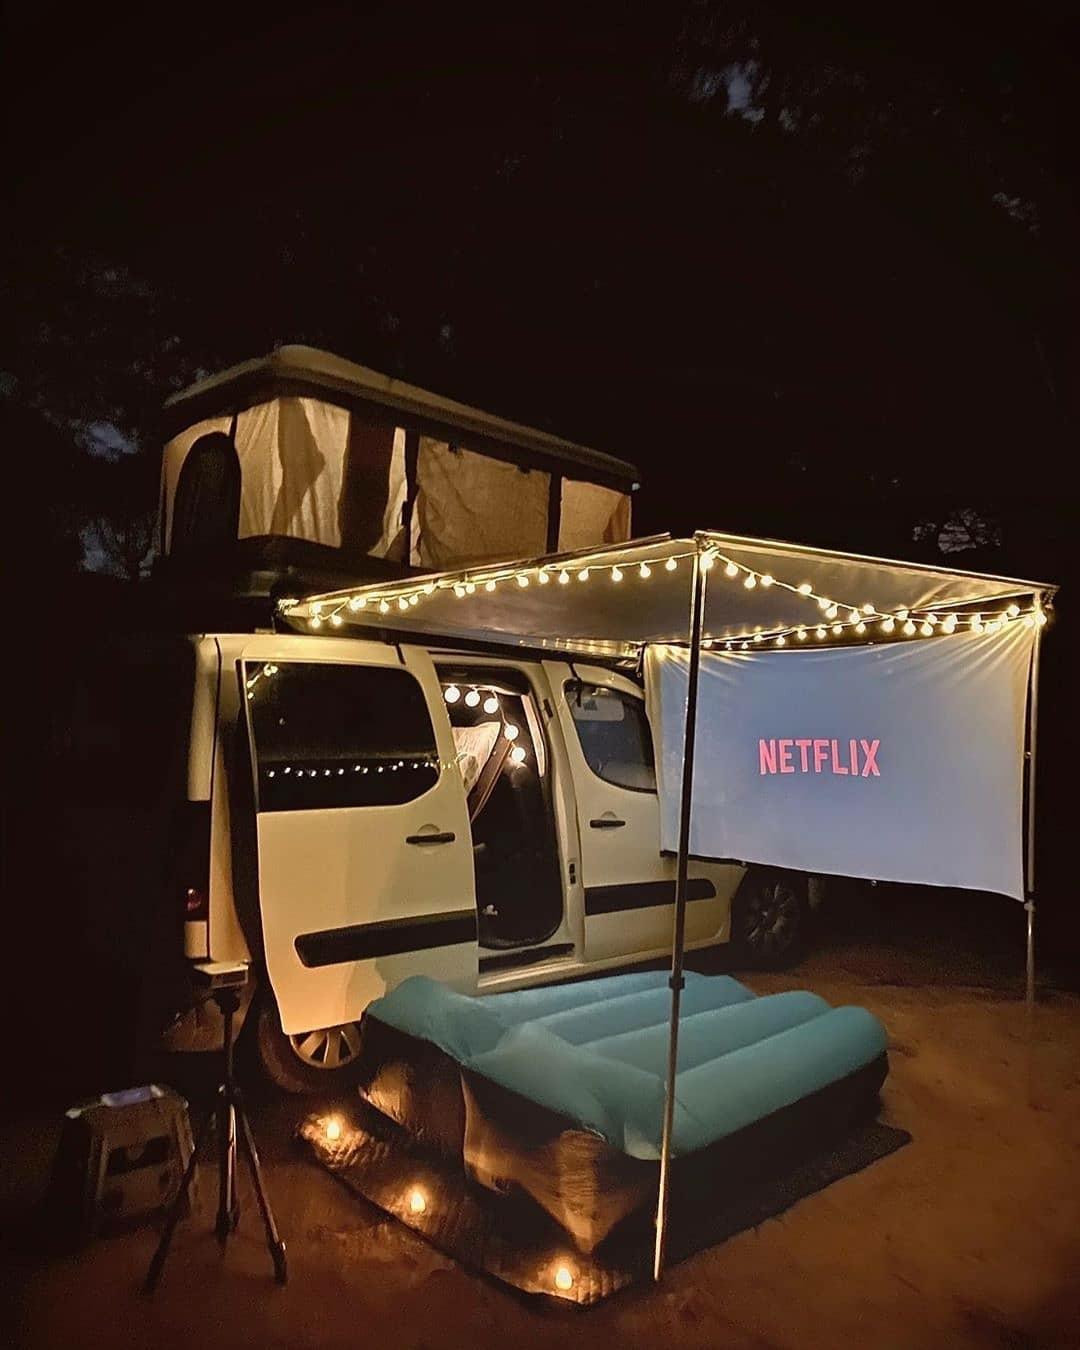 netflix screen outside camper van